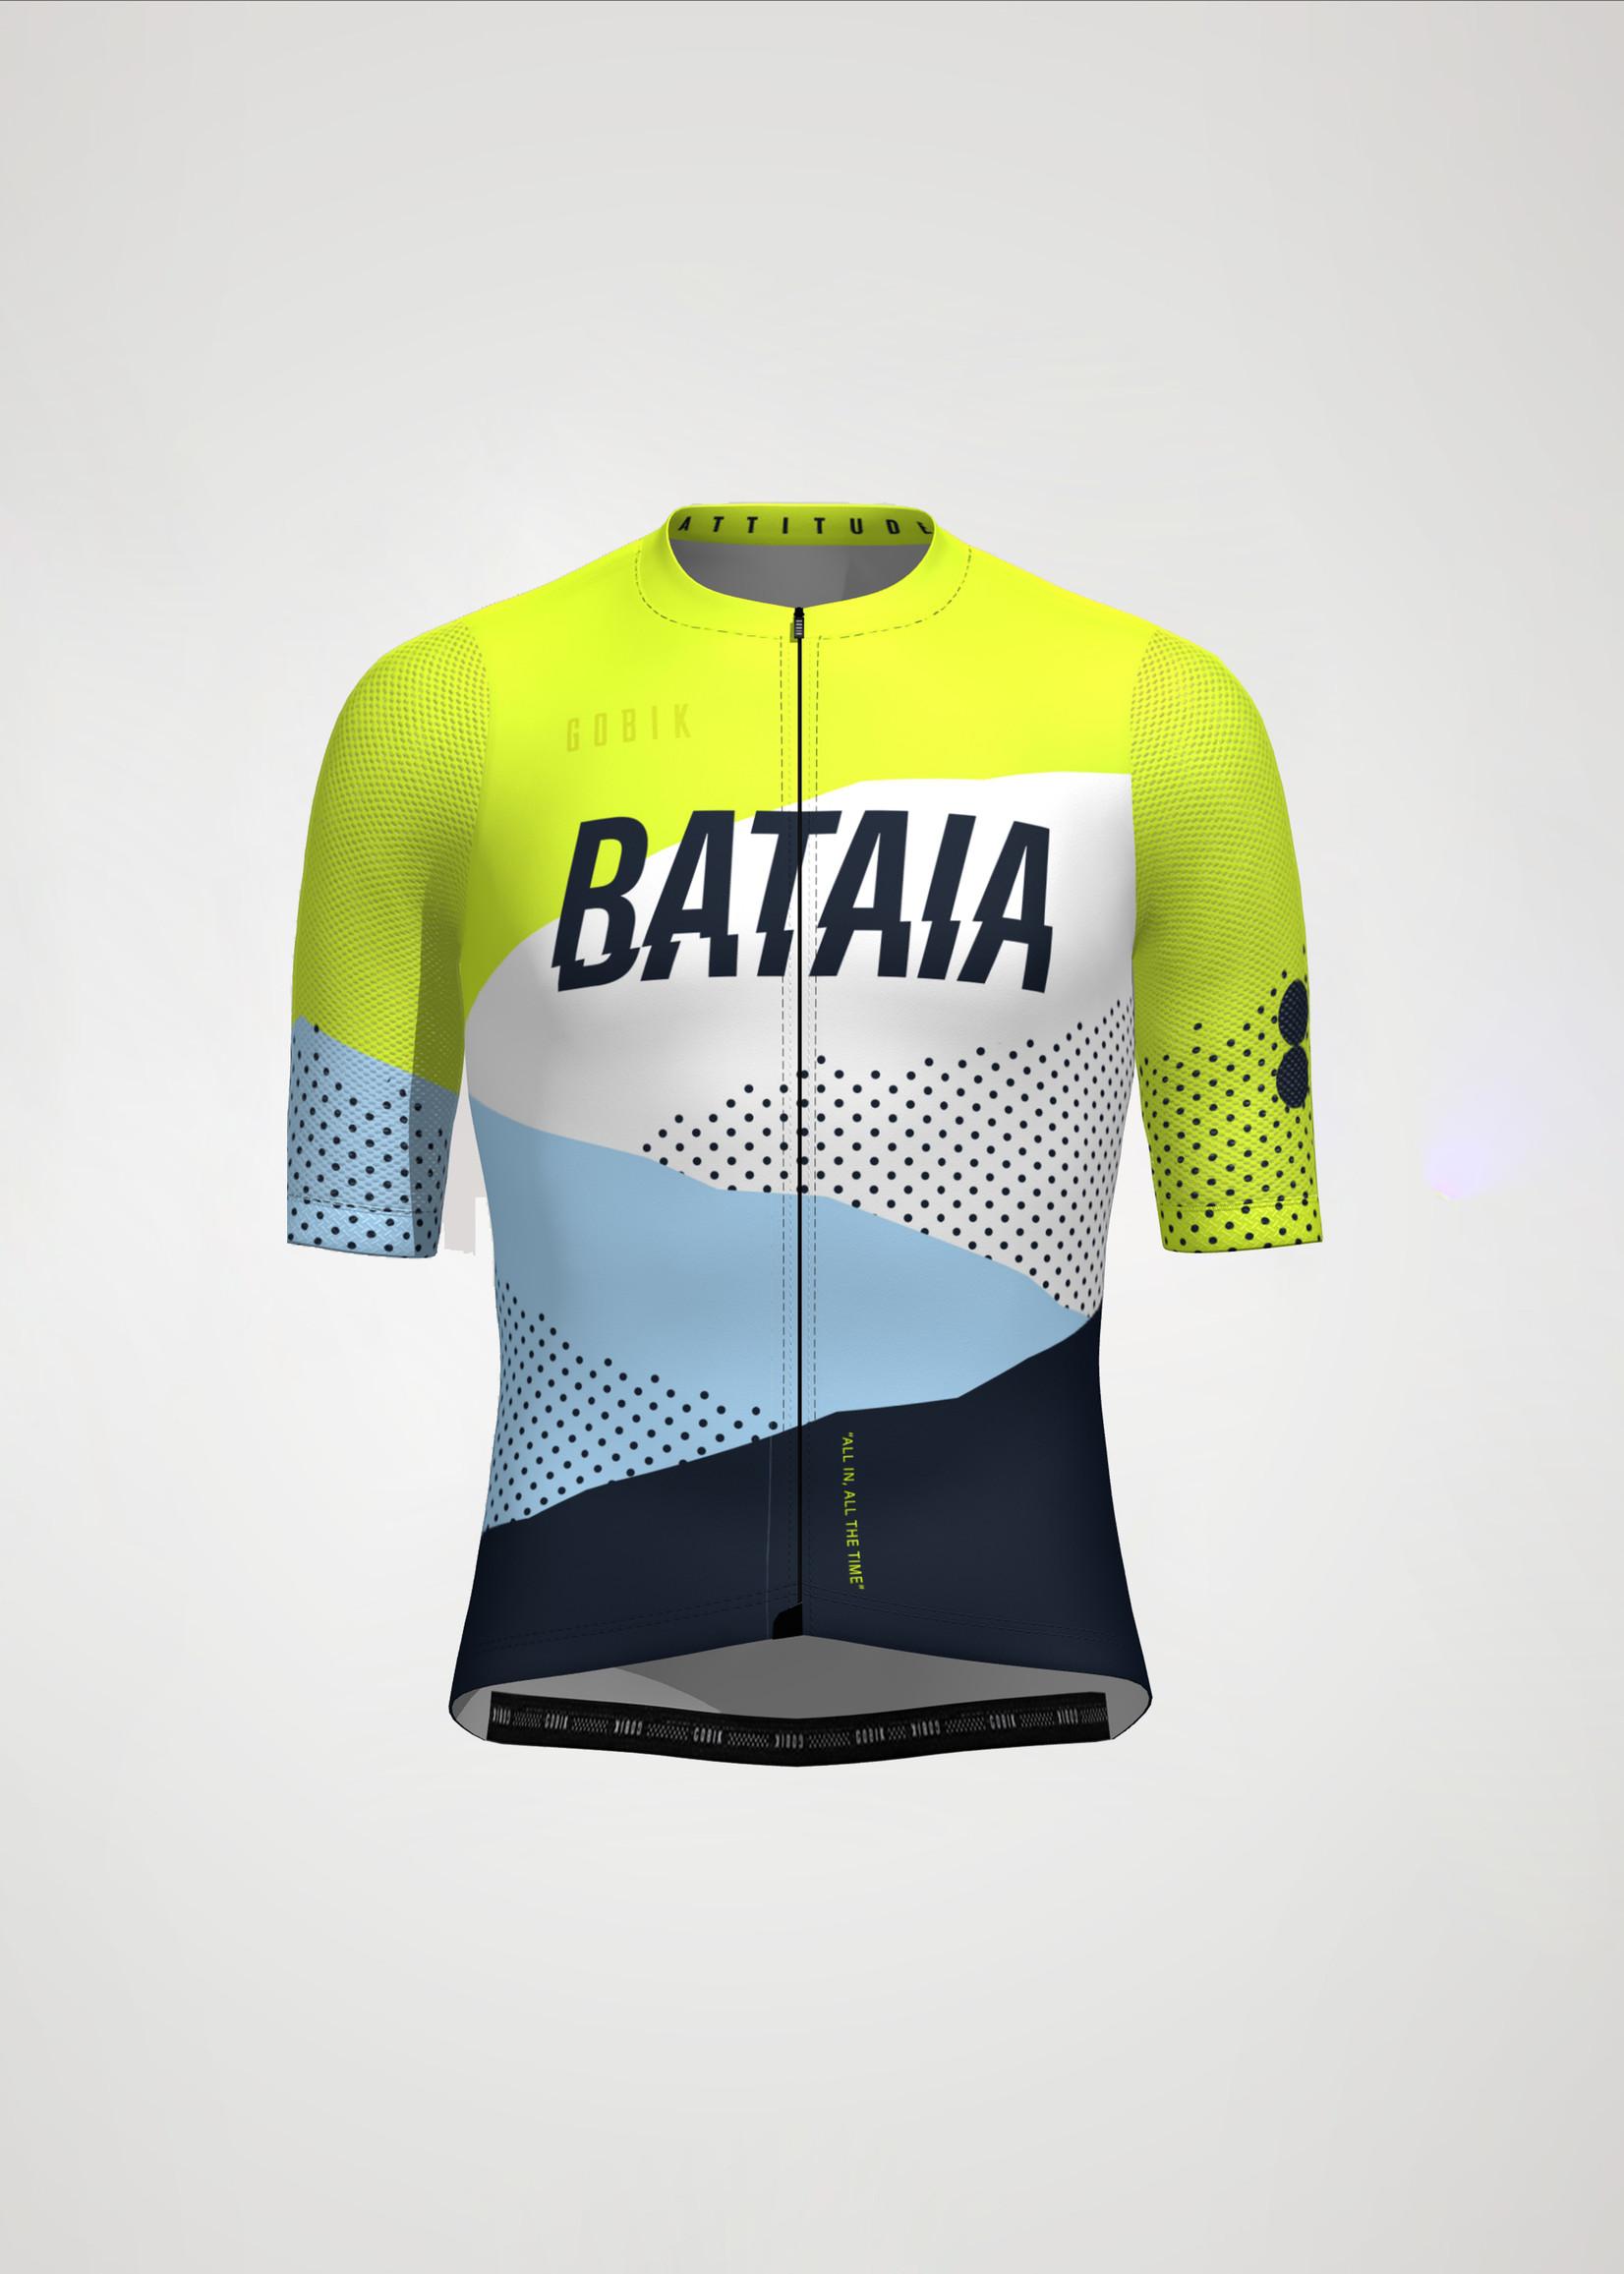 Bataia Team Jersey